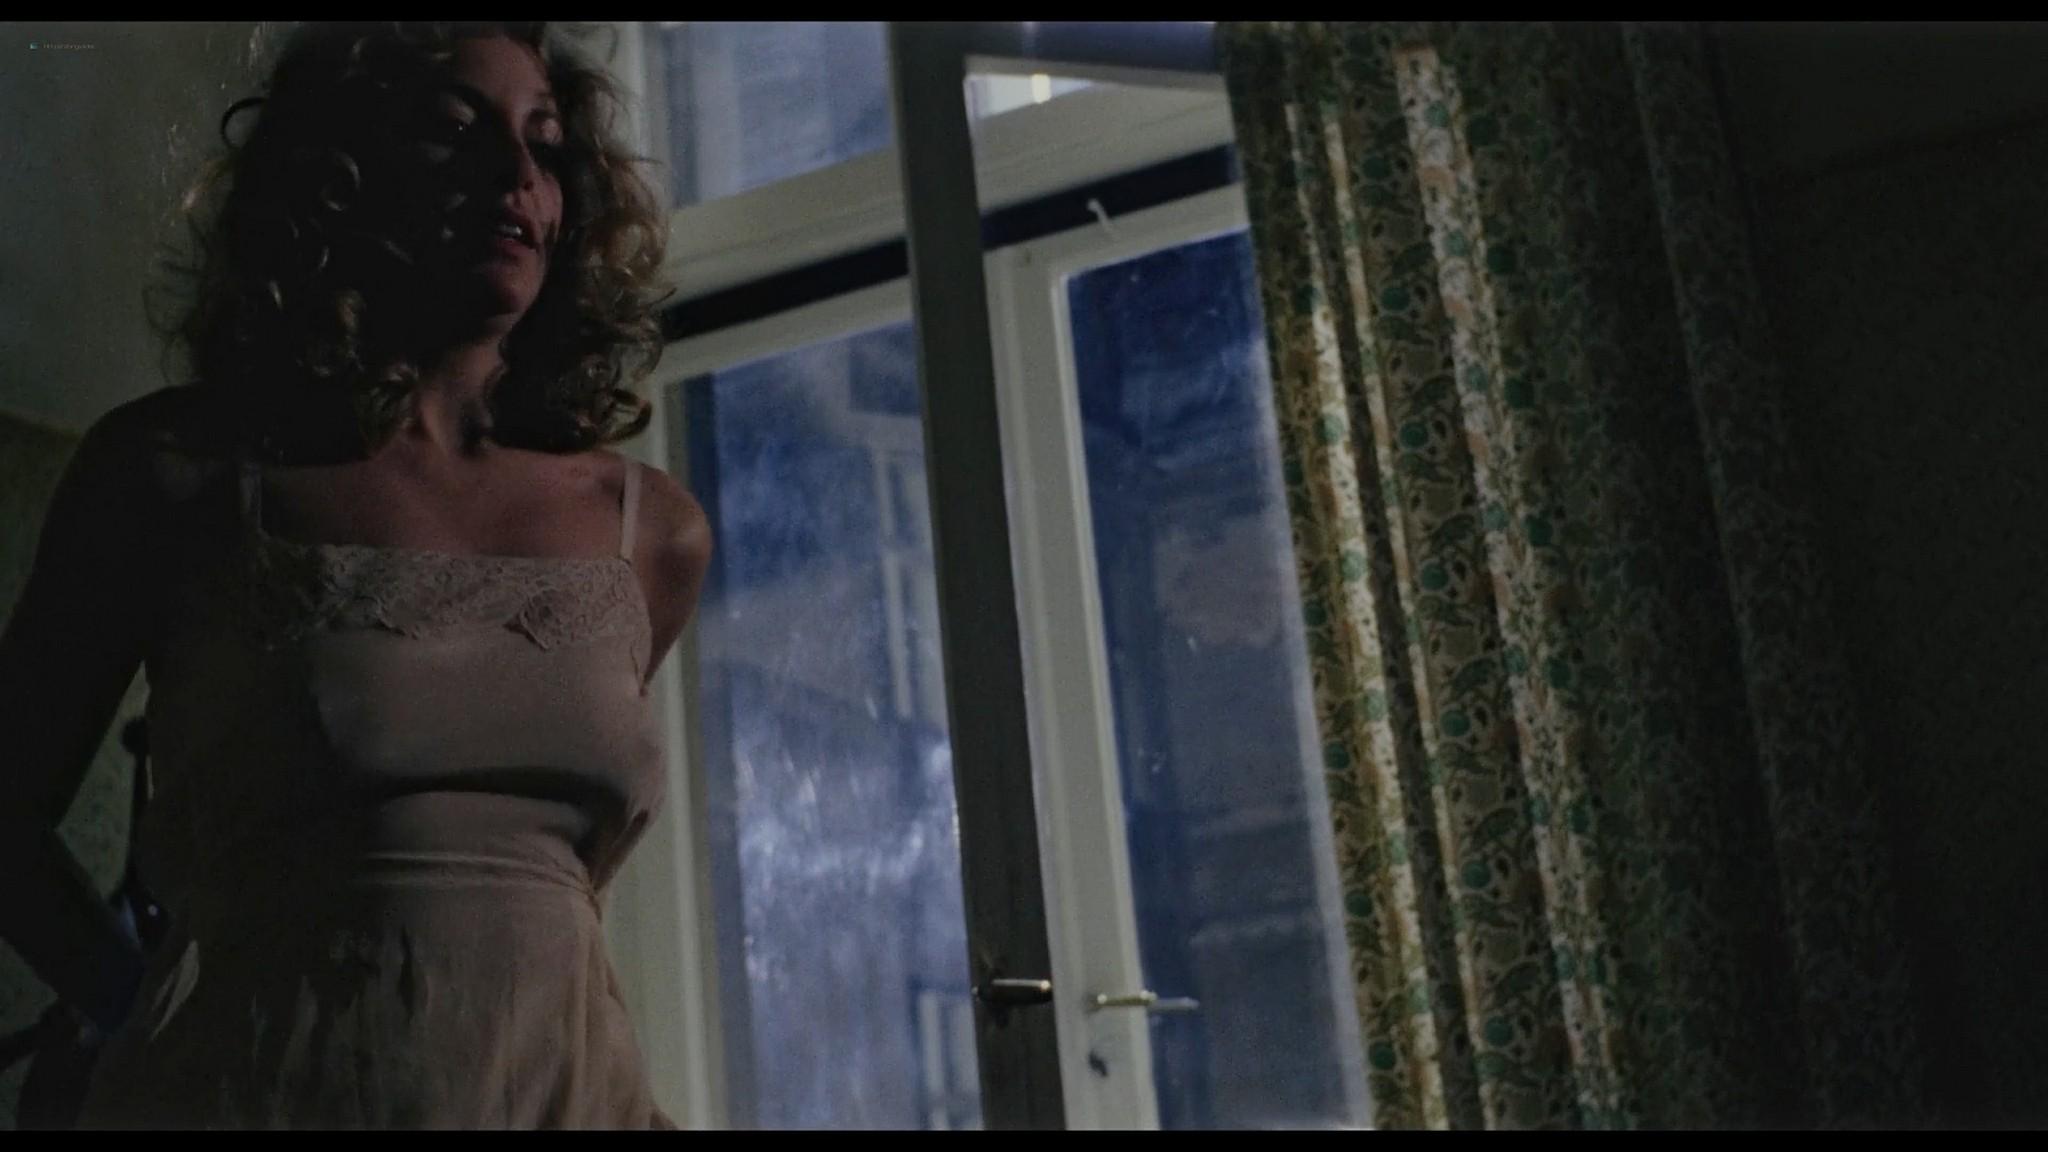 Sydne Rome hot see through and sexy Just a Gigolo 1978 1080p BluRay 2